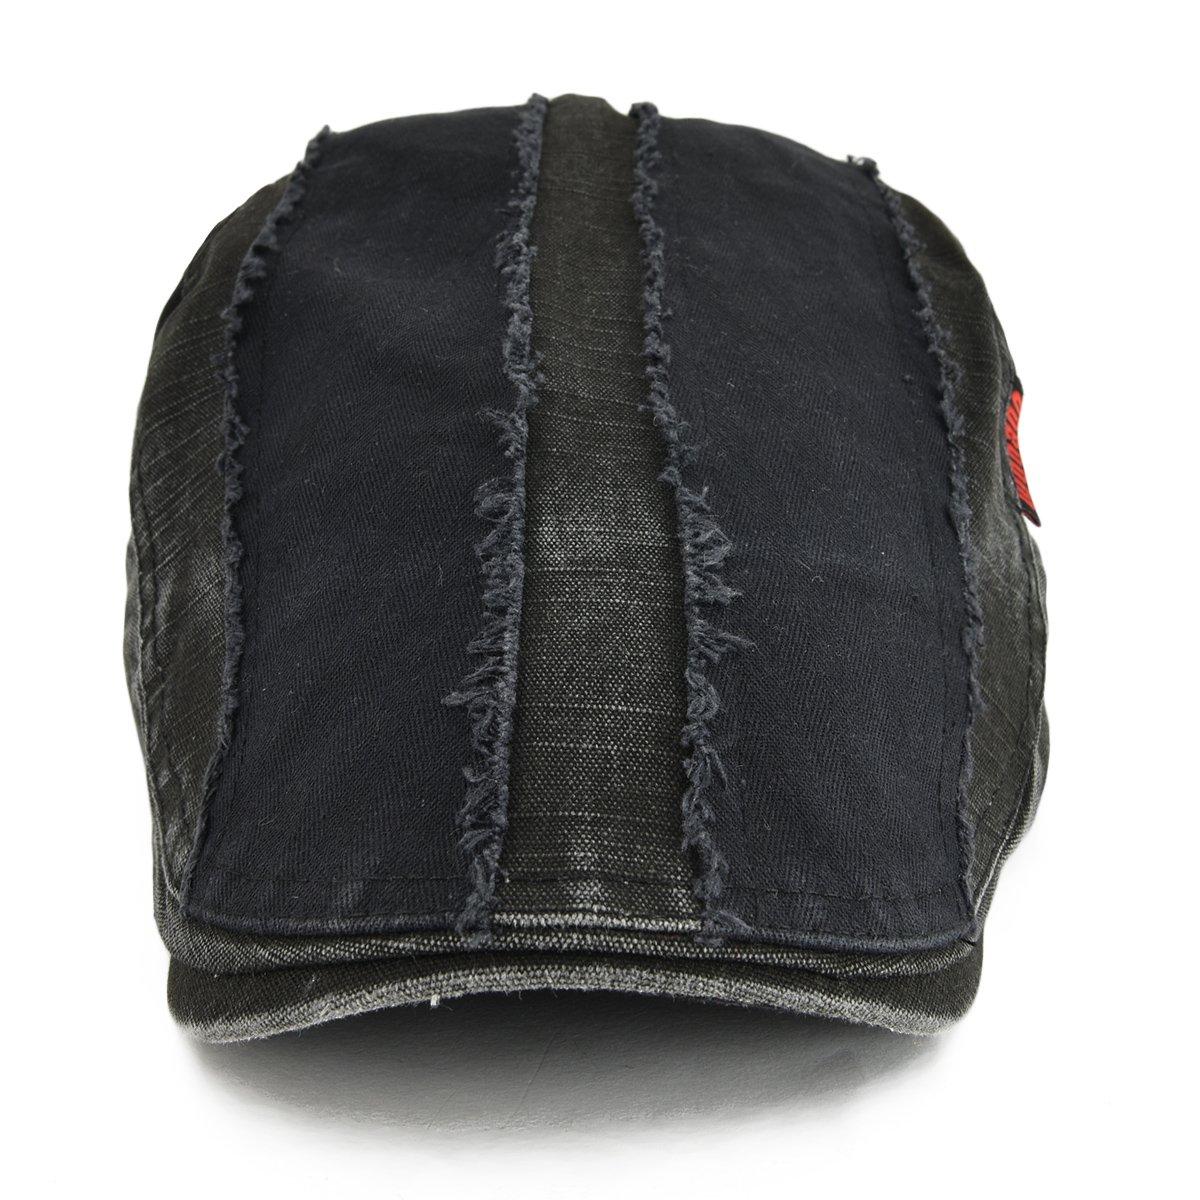 7debb159ca7 VOBOOM 100% Cotton Distressed Ivy Caps Newsboy Caps Cabbie Hat Gatsby Hat  (Black) - BDMZ101-Blk   Newsboy Caps   Clothing